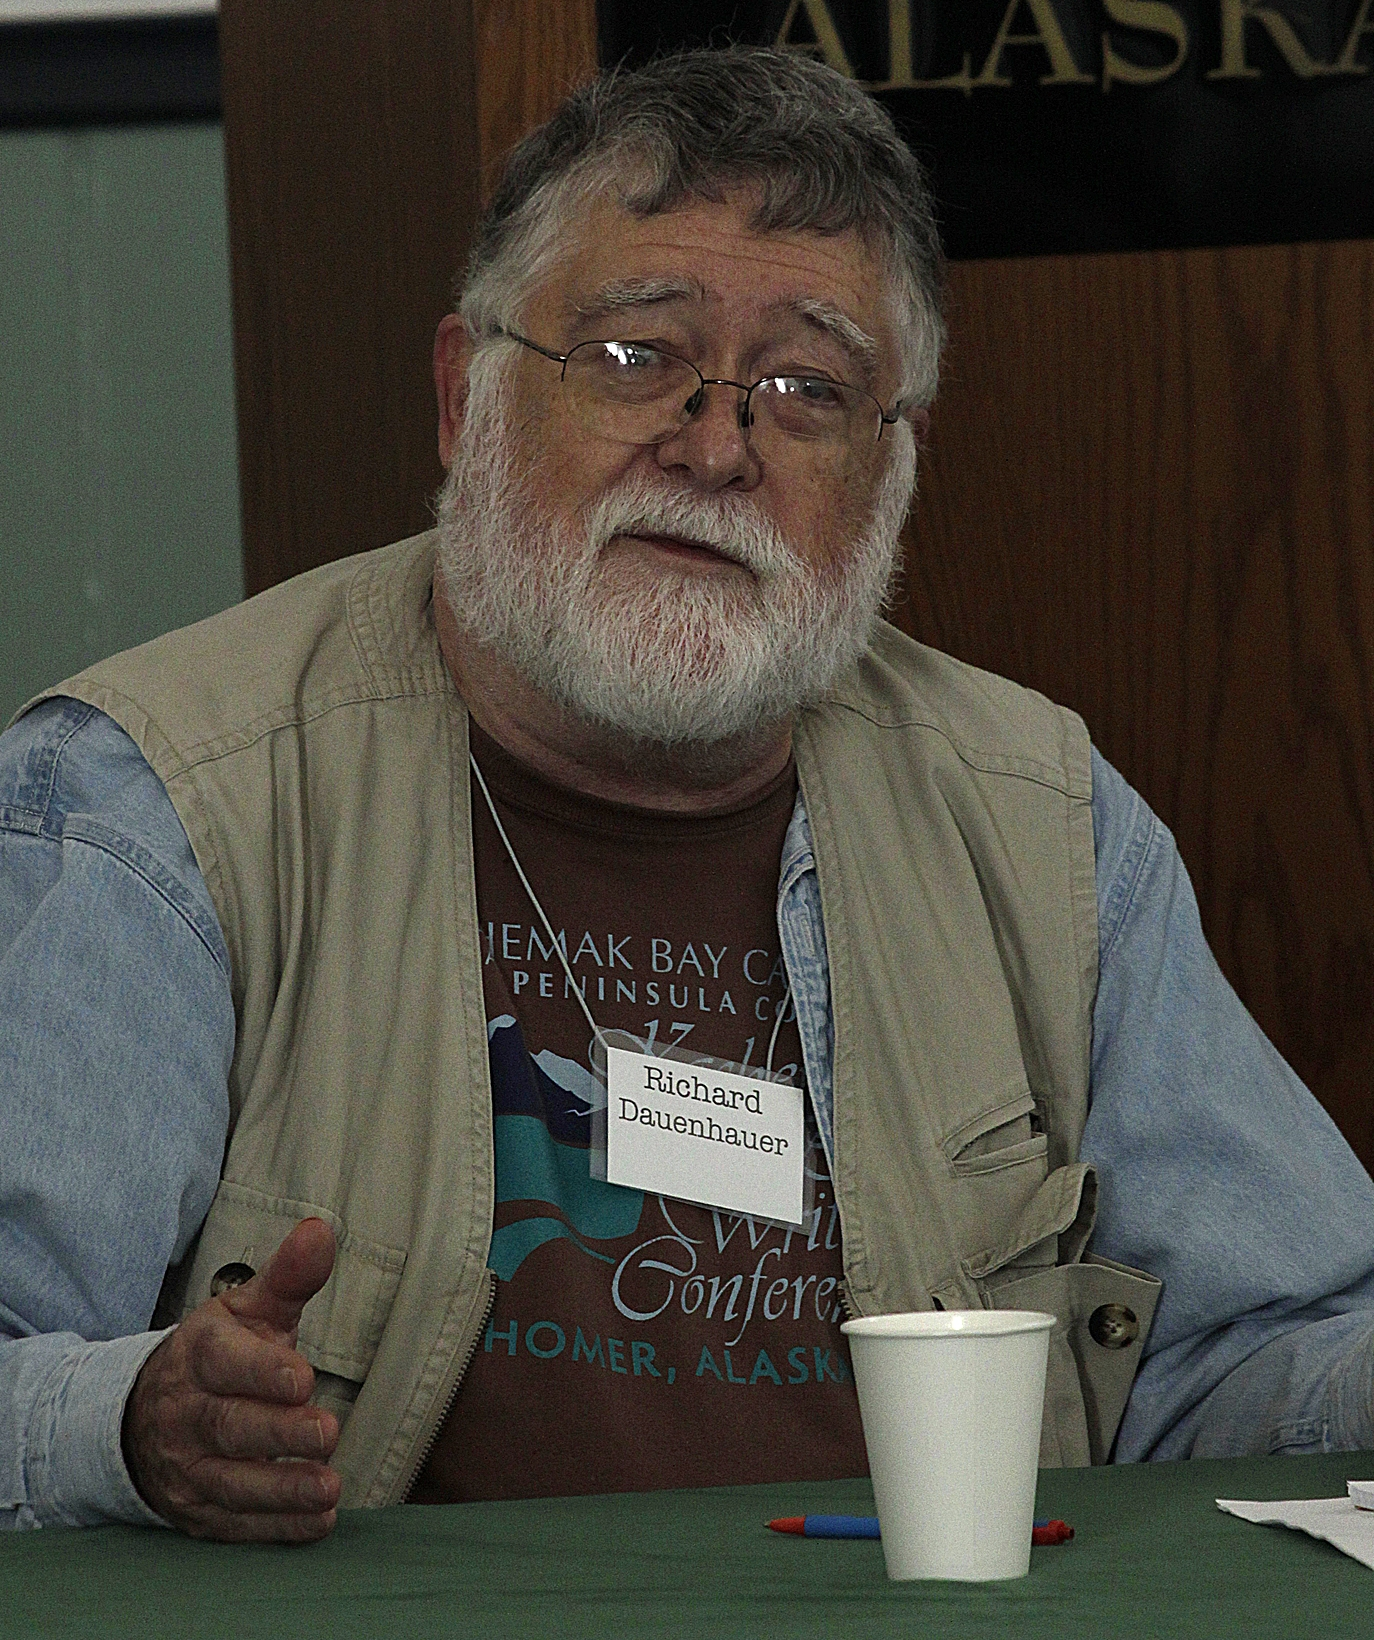 Richard Dauenhauer, less than three months before his death, speaking at a writers' symposium in [[Skagway, Alaska